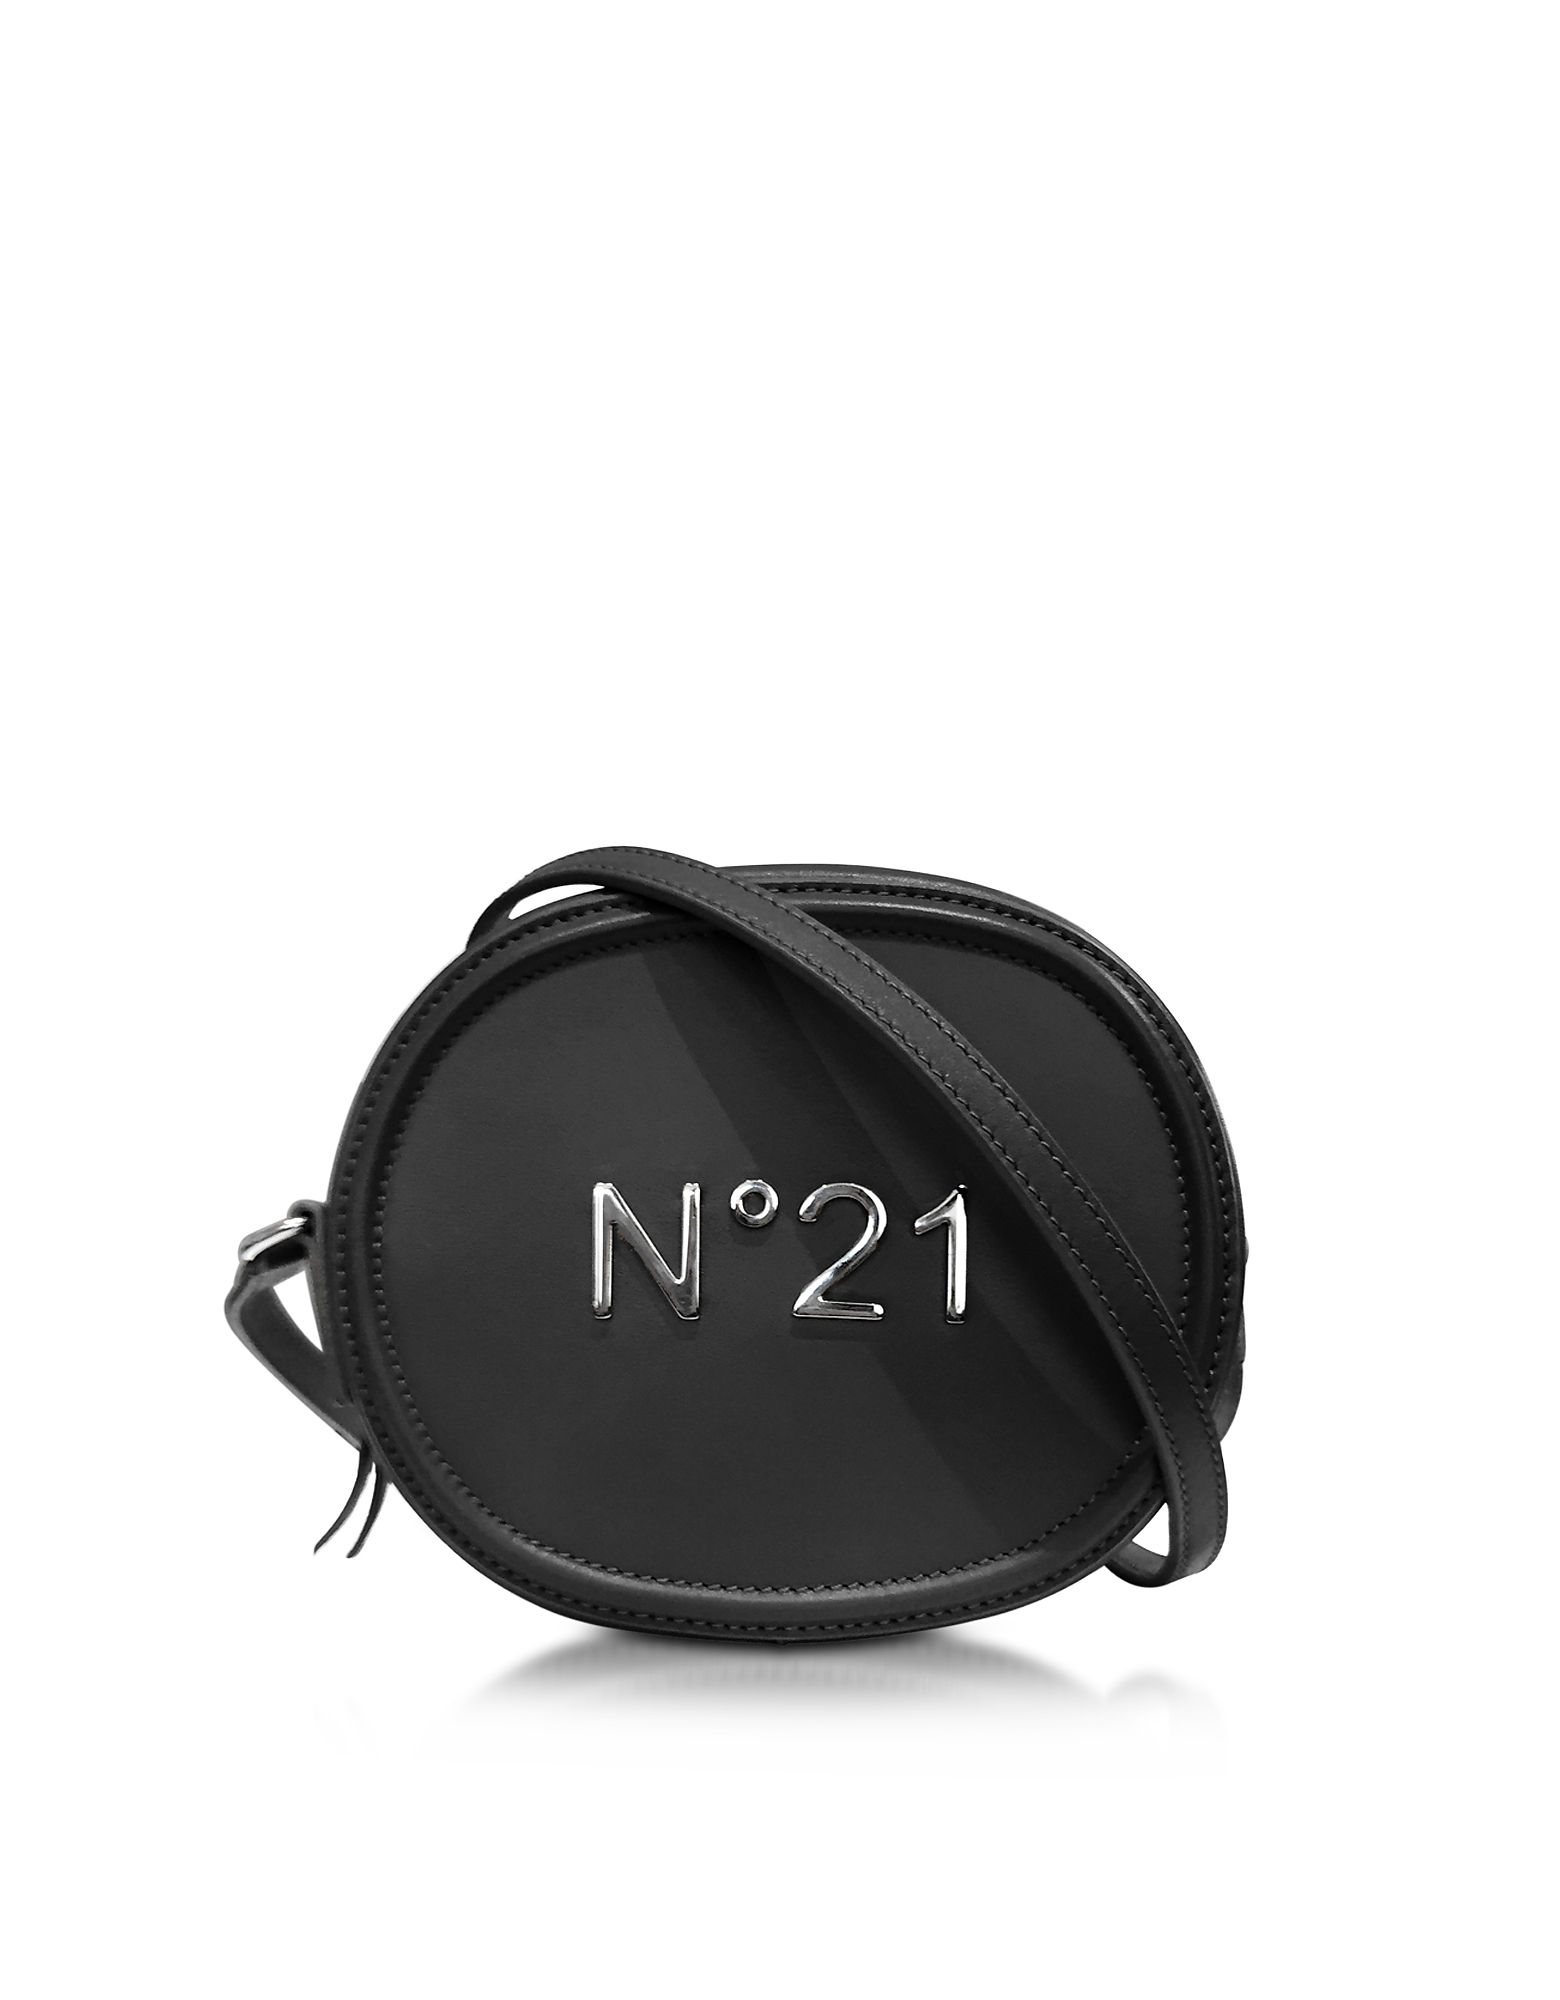 N°21 Black Leather Oval Crossbody Bag w/Metallic Embossed Logo